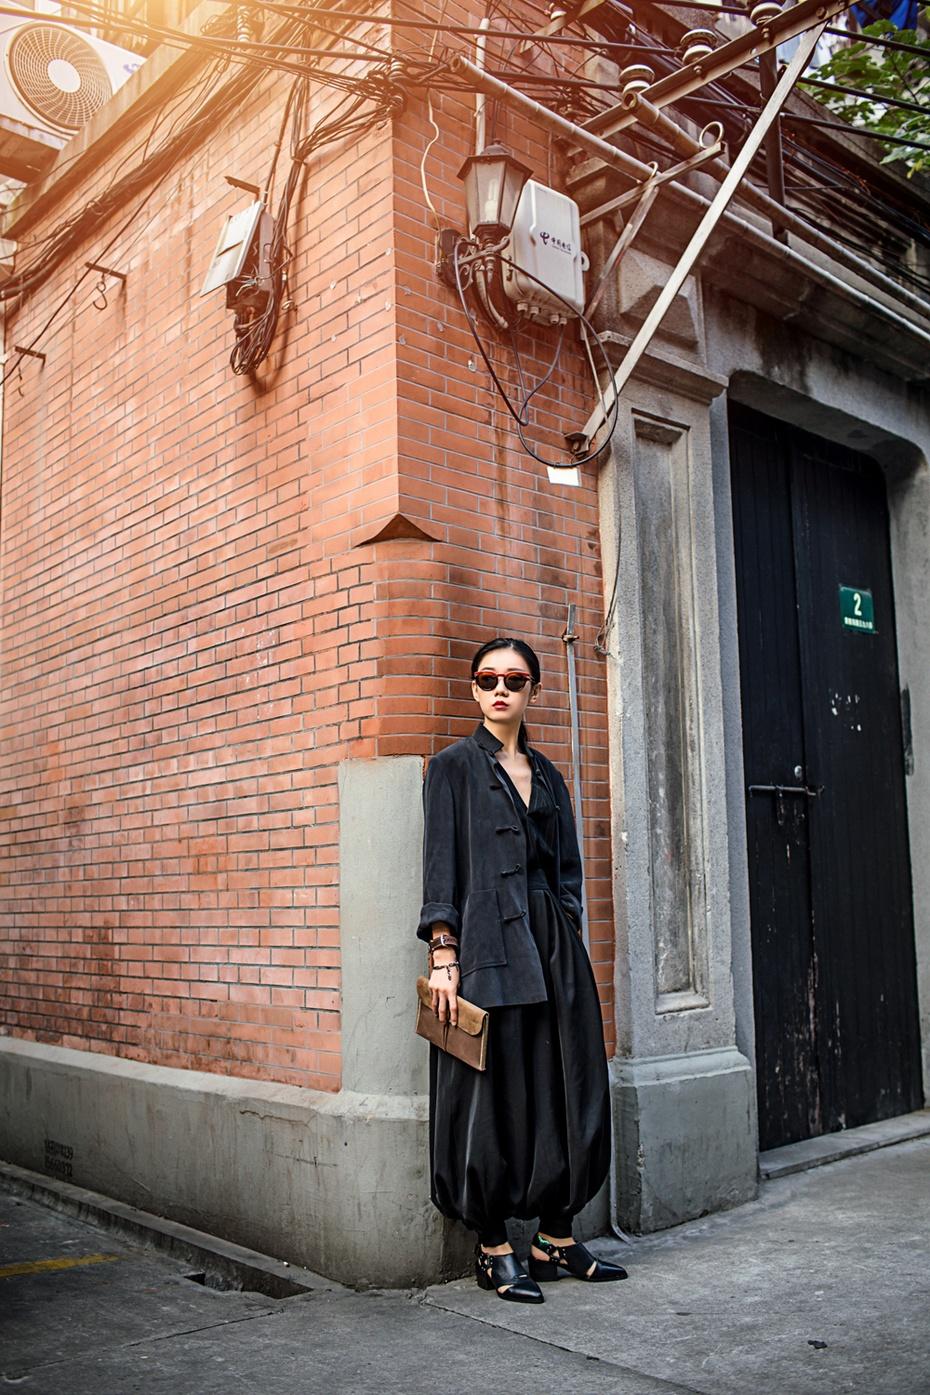 [Ava搭配日记]老上海style - AvaFoo - Avas Fashion Blog